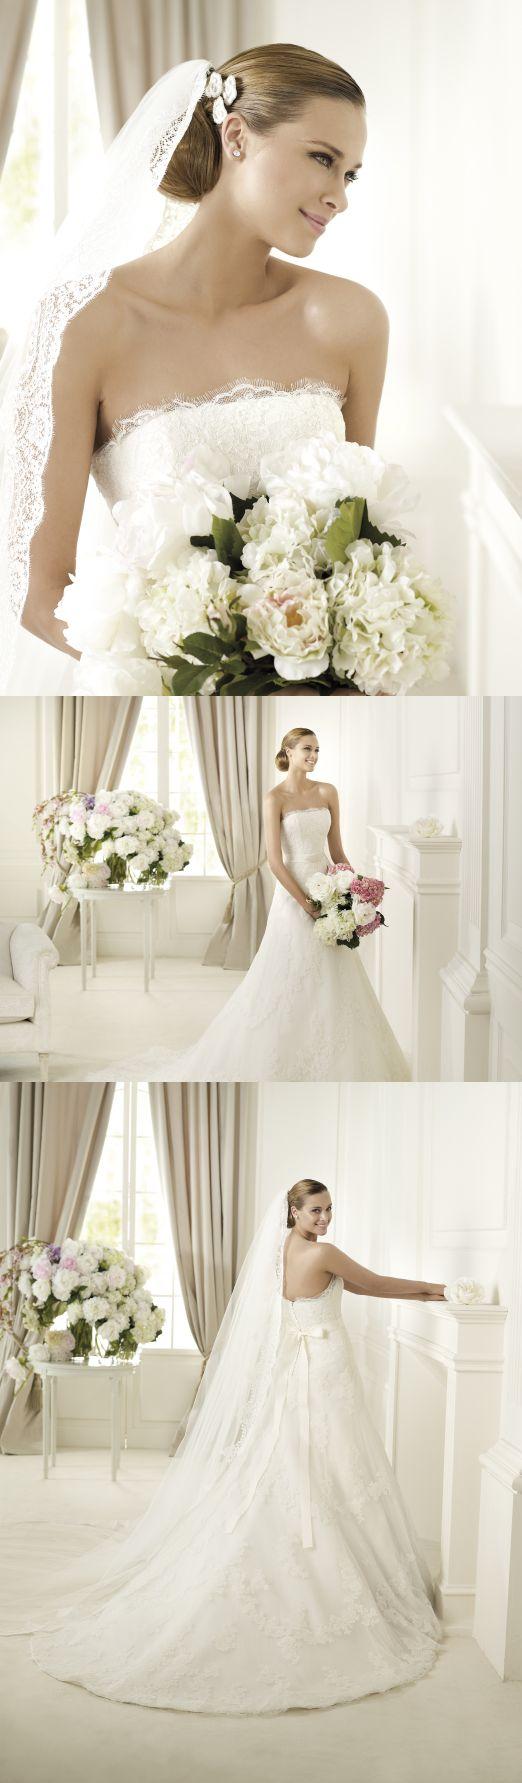 Elegant Bride. #Weddingdress #Wedding #Dress #Dublin #Ohio #Columbus